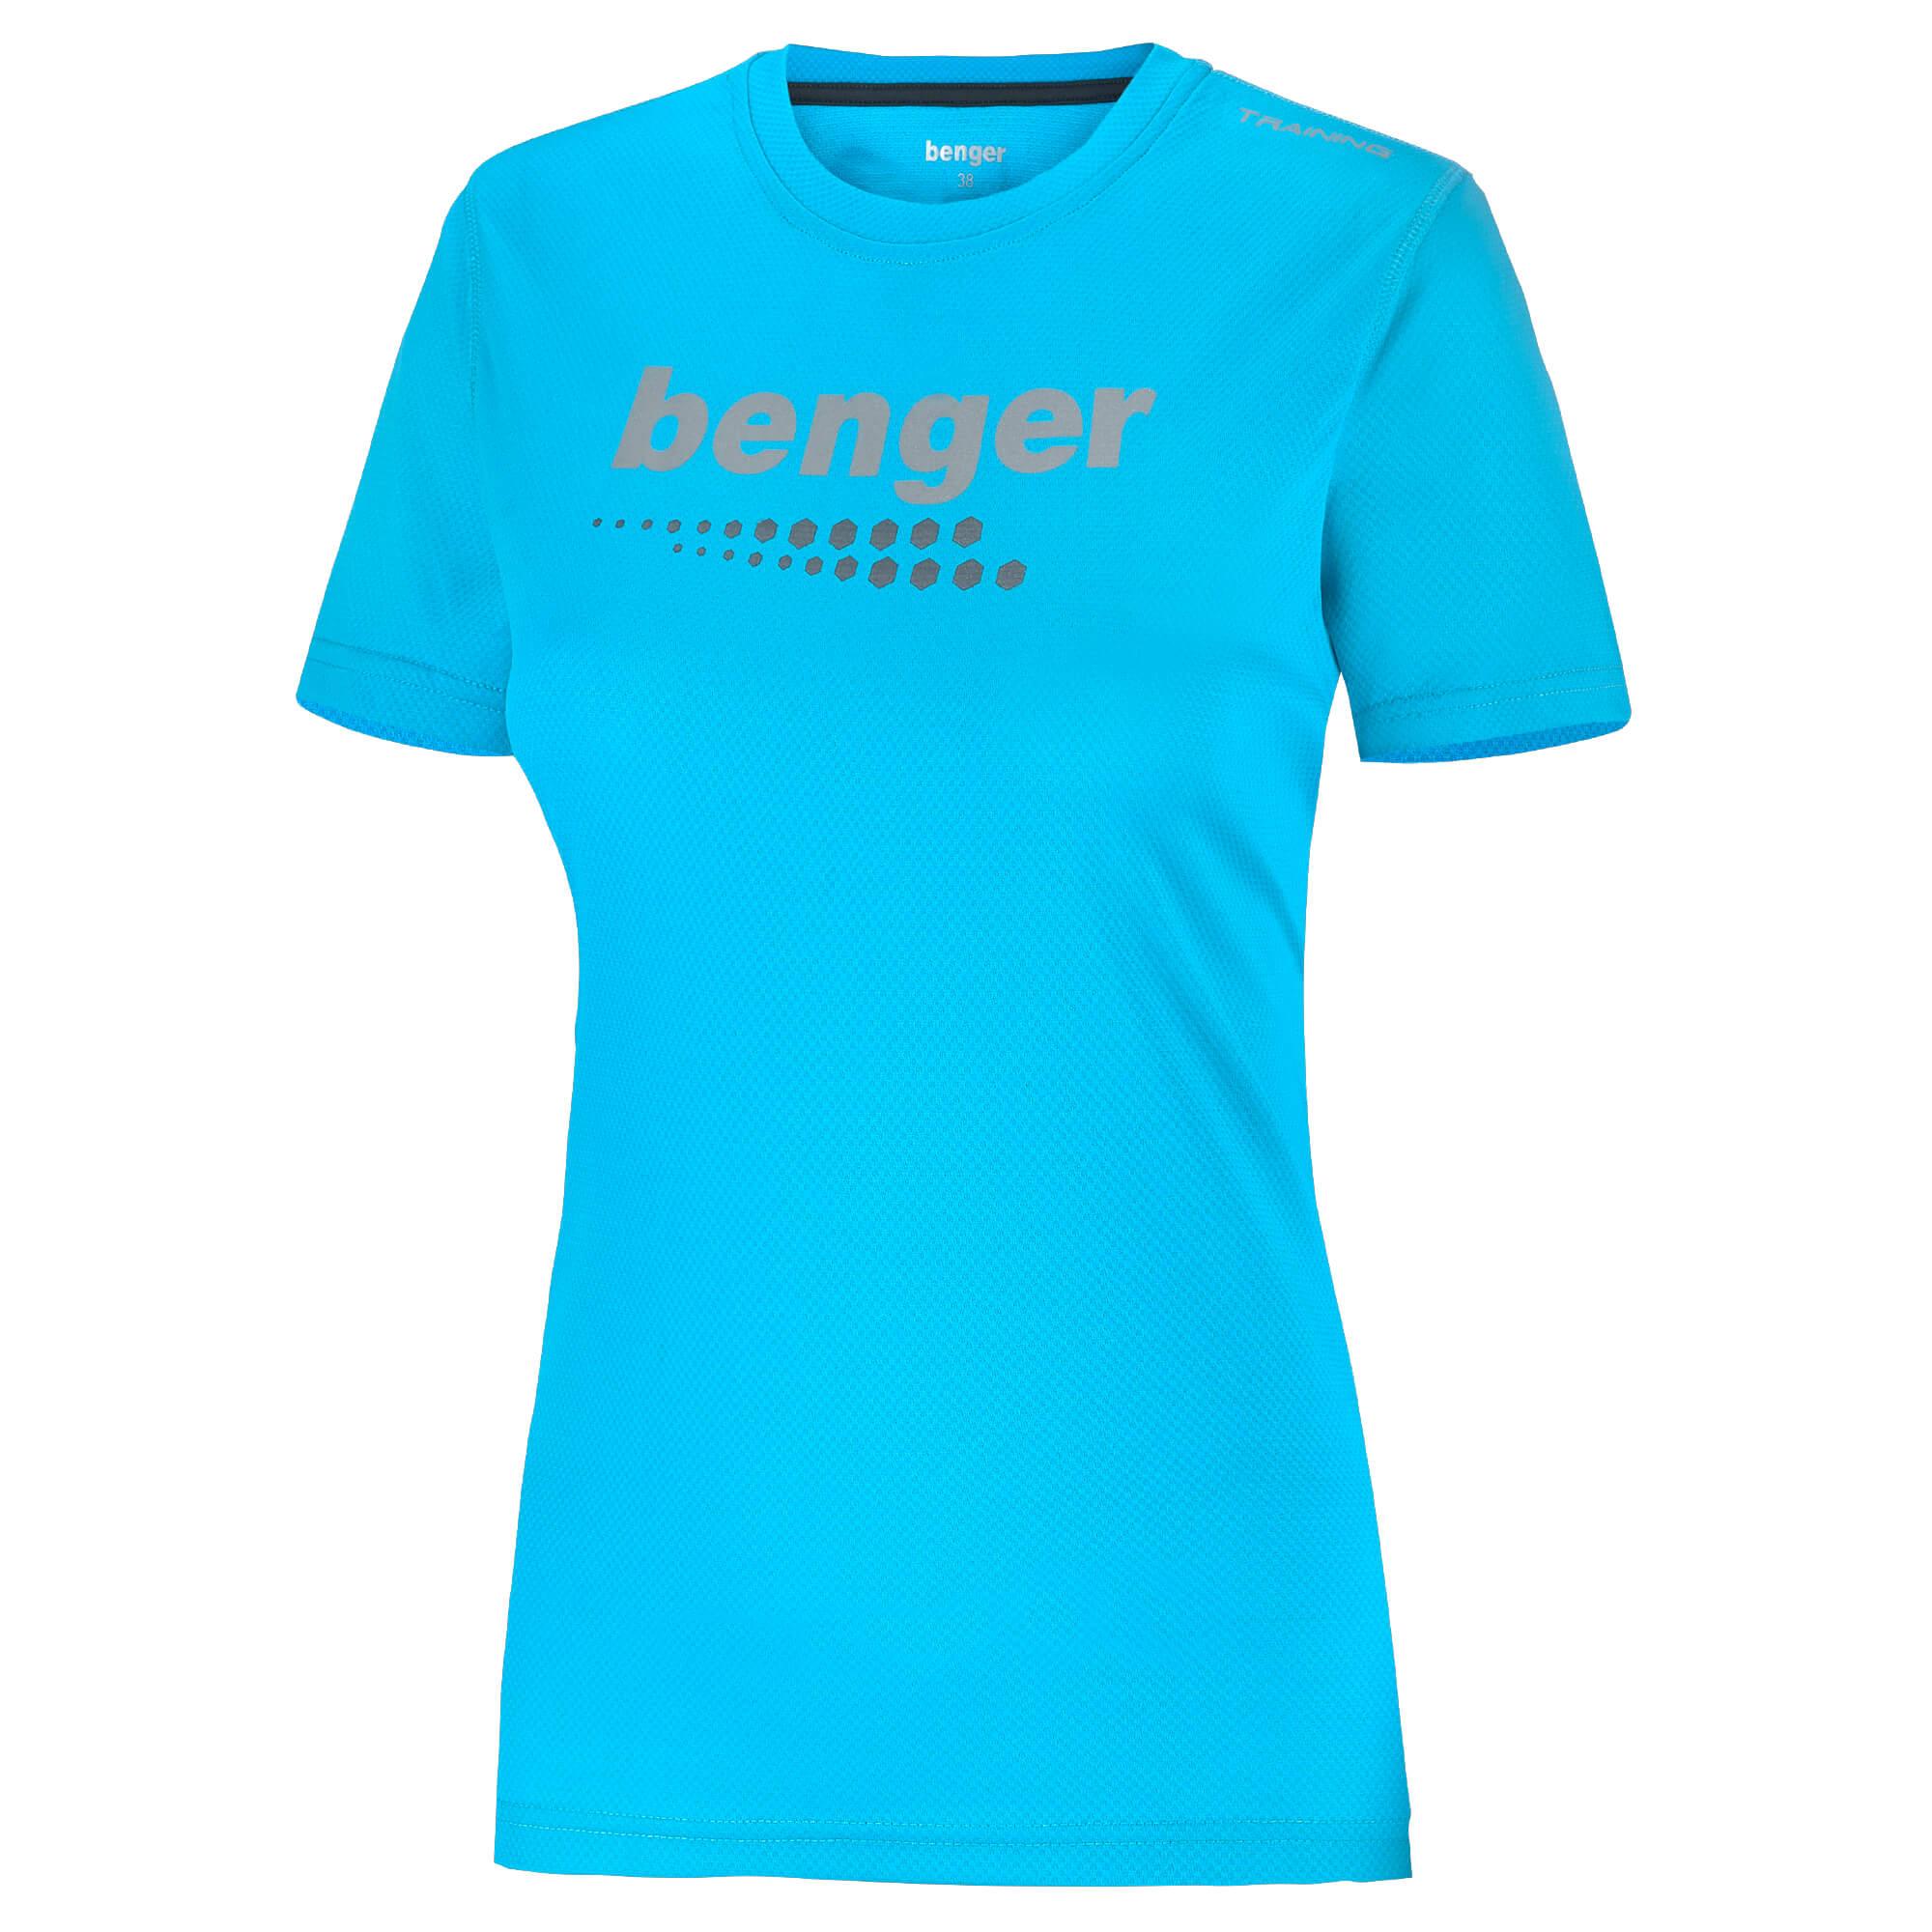 Basic Benger poza